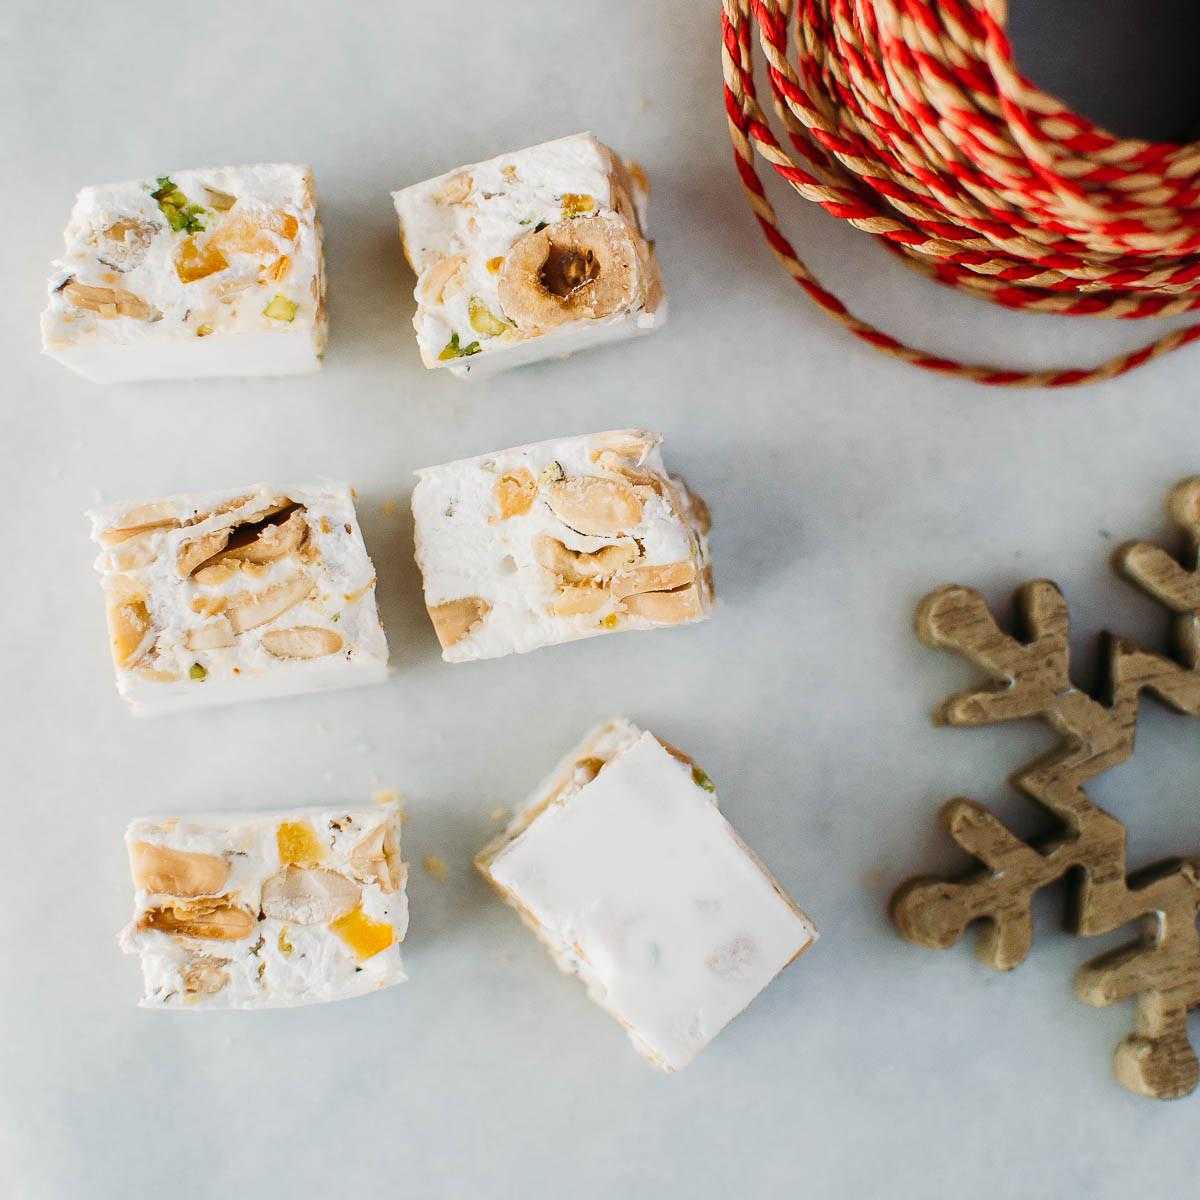 Italian Christmas Candy  Soft Torrone Italian Christmas Nougat Candy